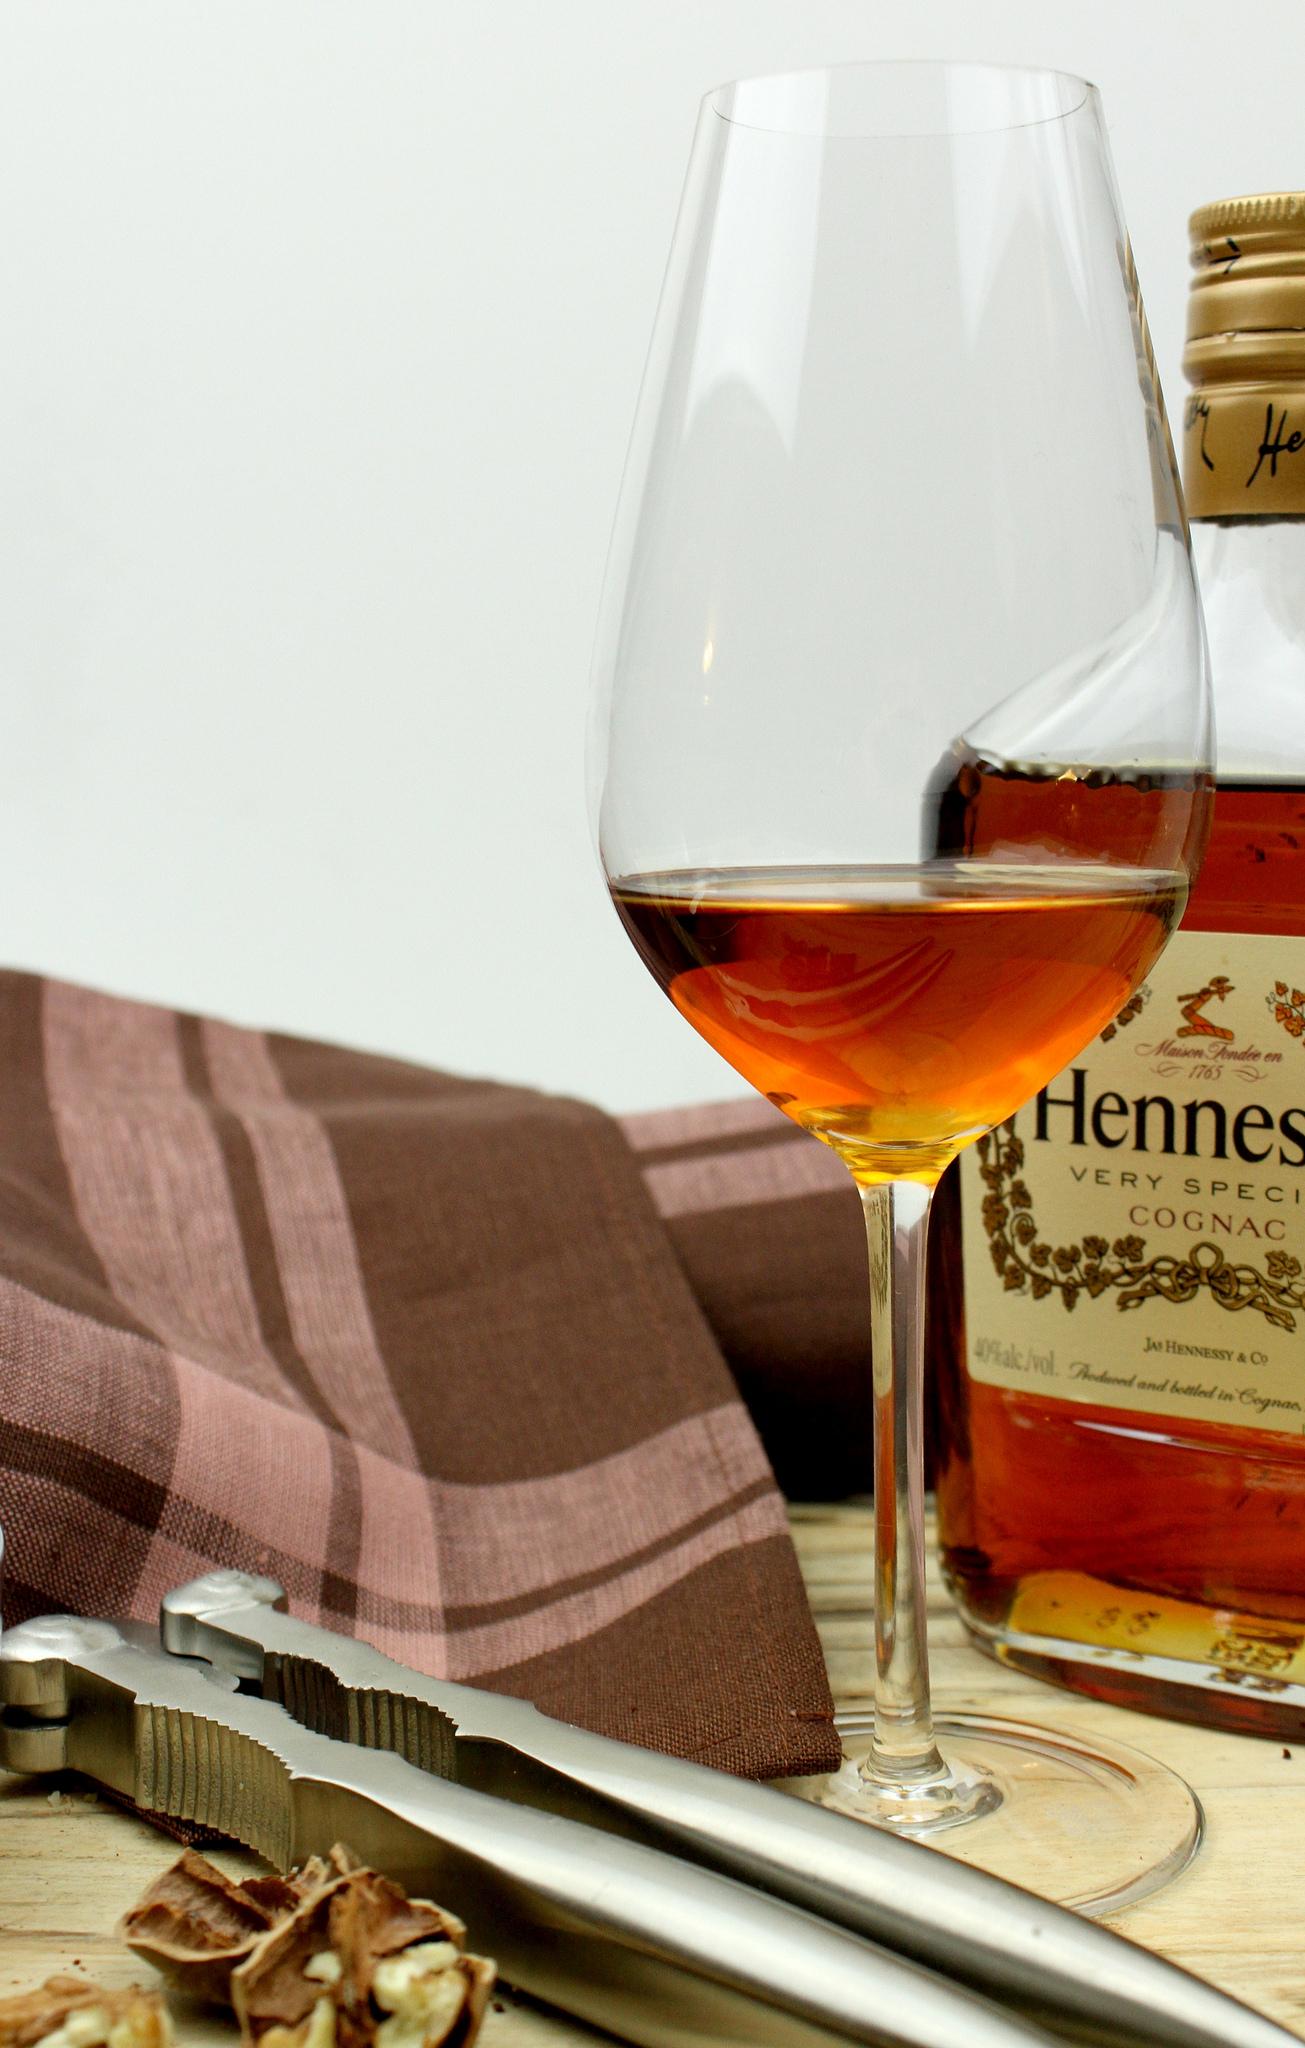 enoteca cognac glass, alessi nut cracker